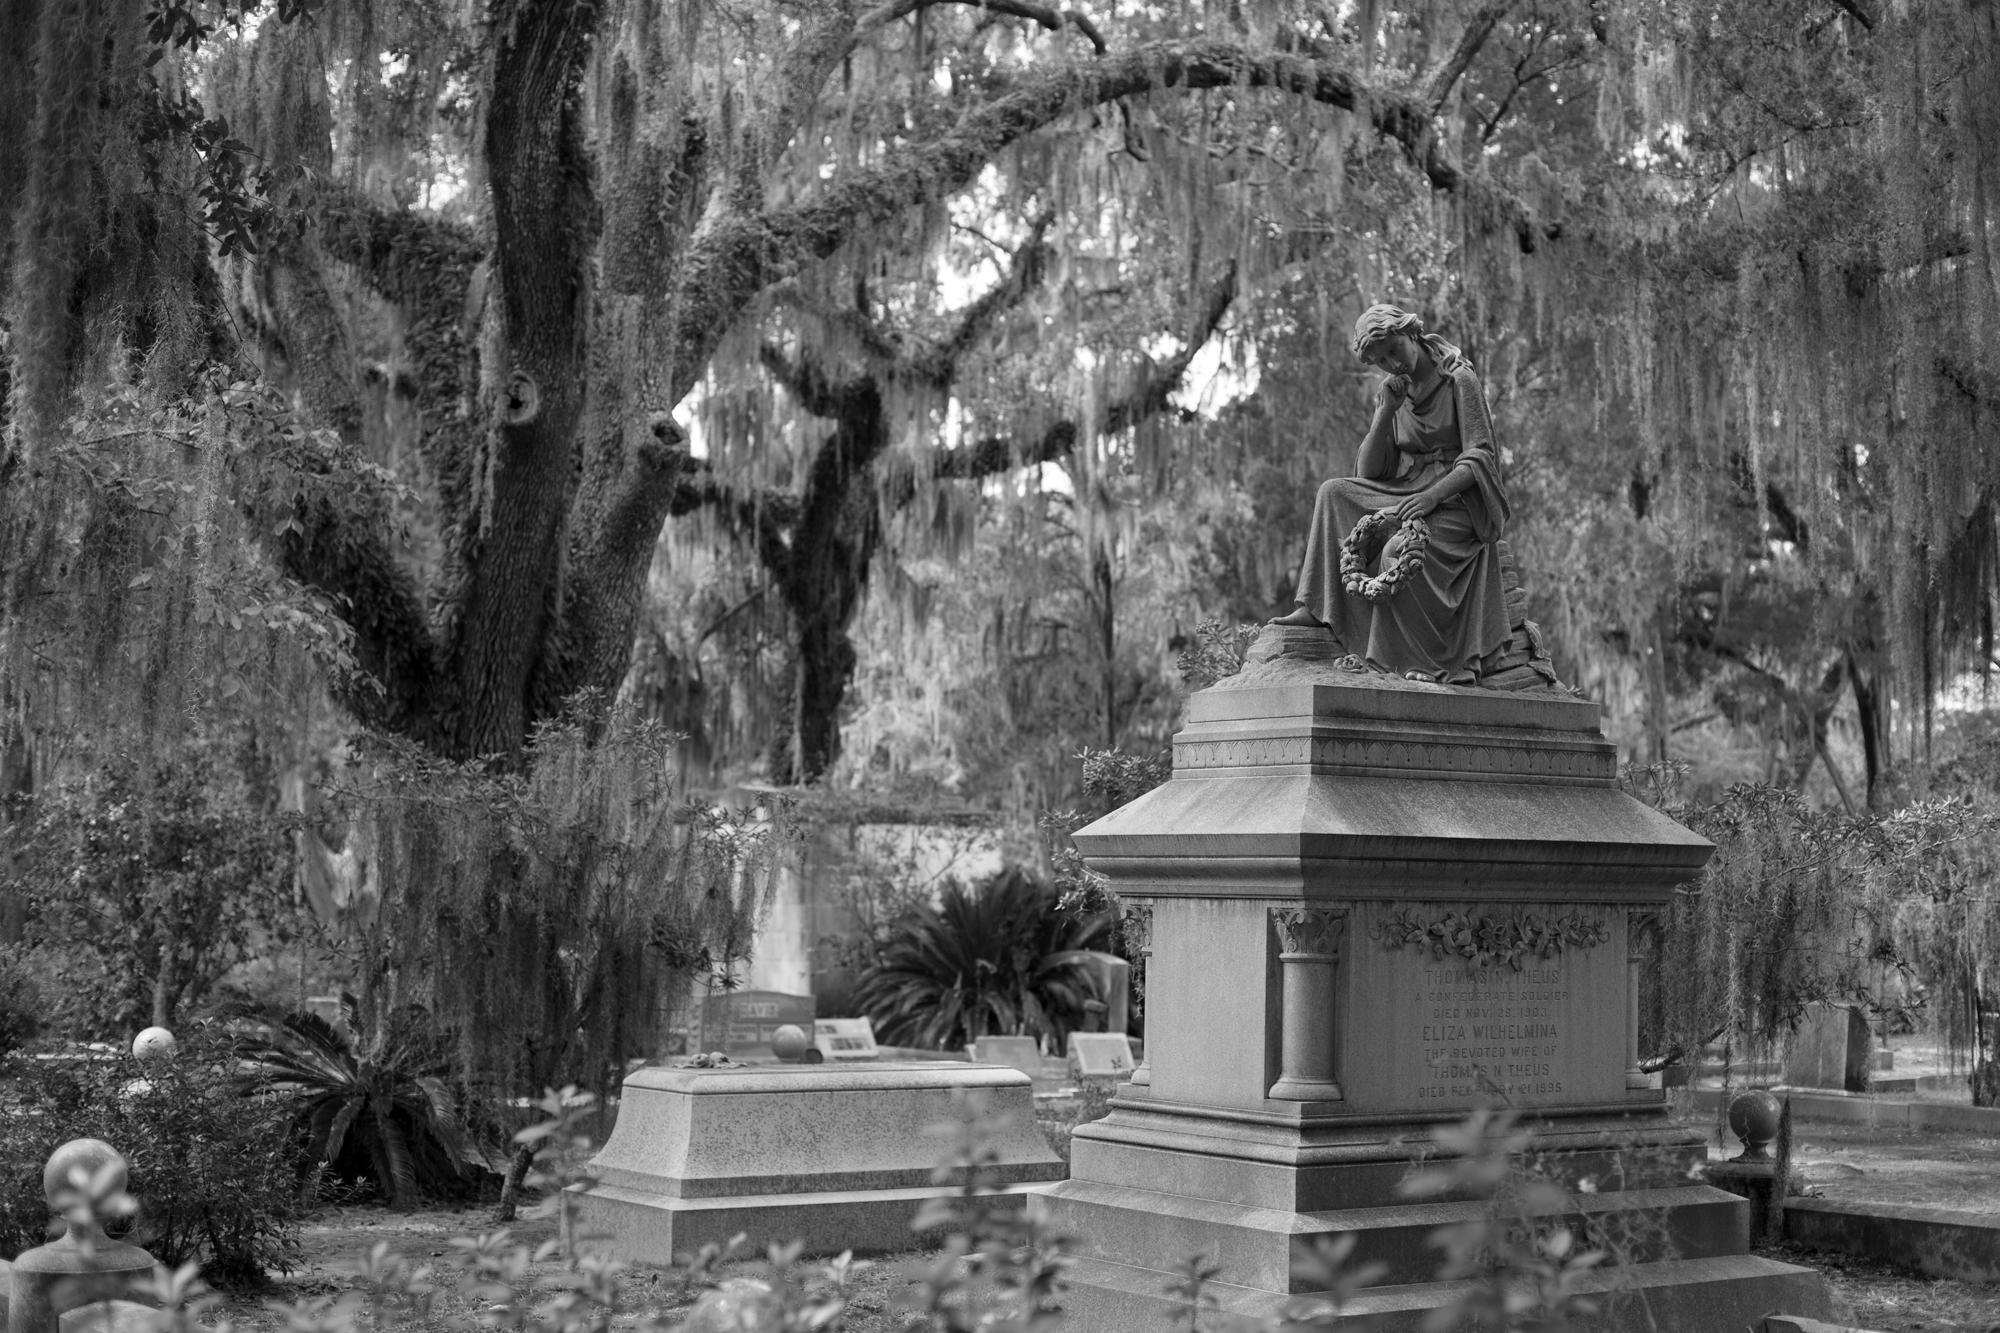 Grave_of_Thomas_N._Theus_and_his_wife_-_Bonaventure_Cemetery_-_Savannah,_GA